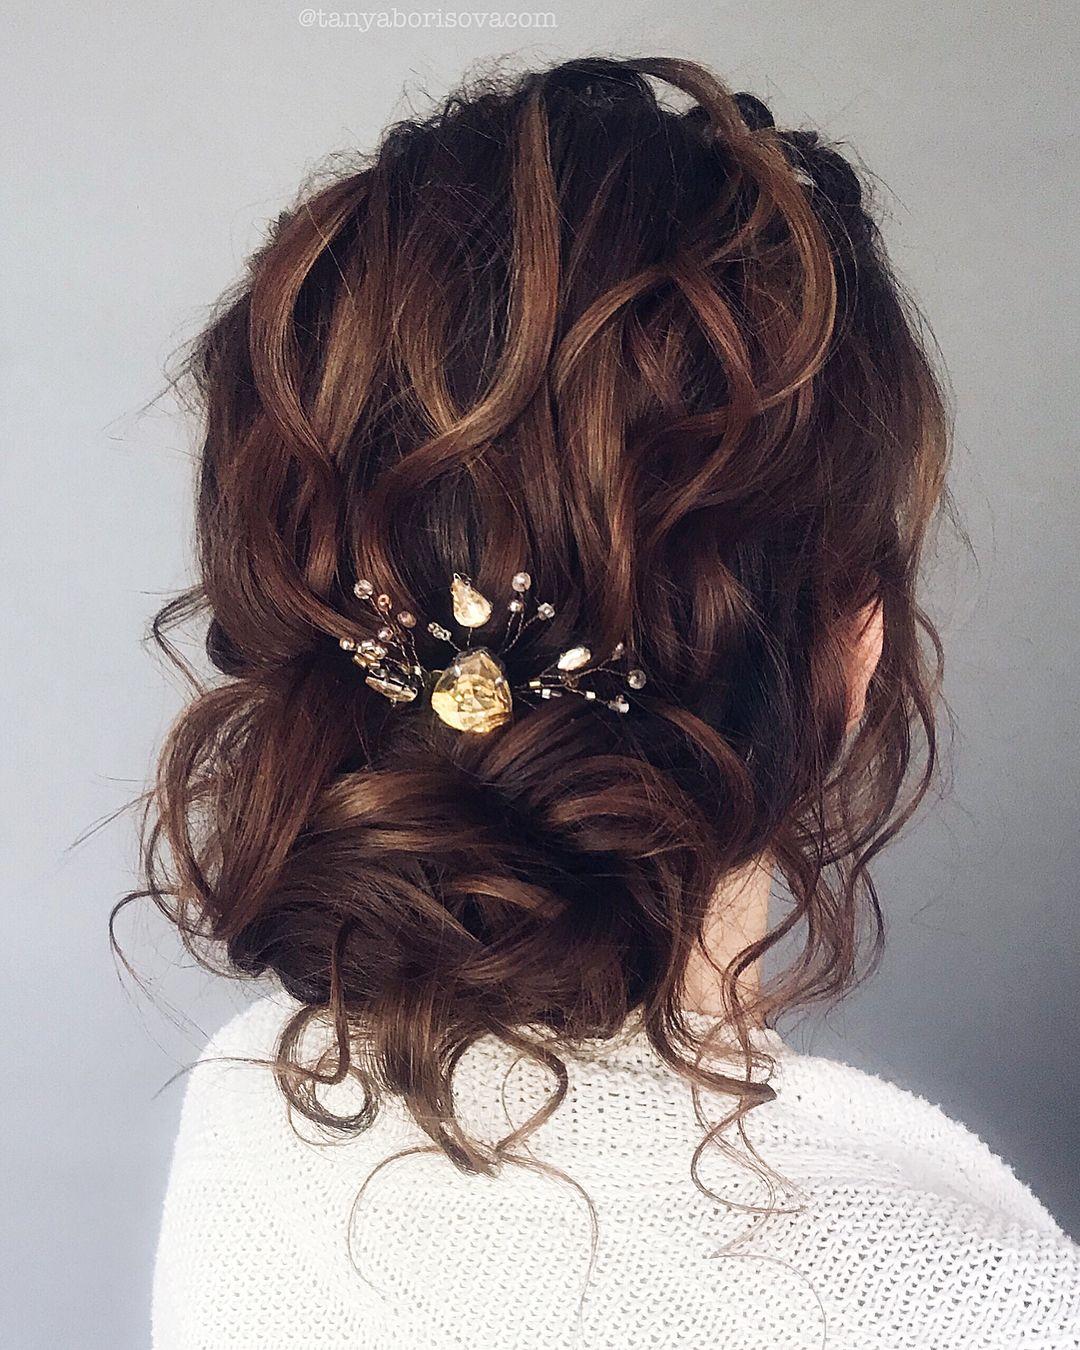 Gorgeous Hairstyle Inspiration - updo wedding hairstyle , textured updo, messy updo, hairstyles #hair #hairstyles